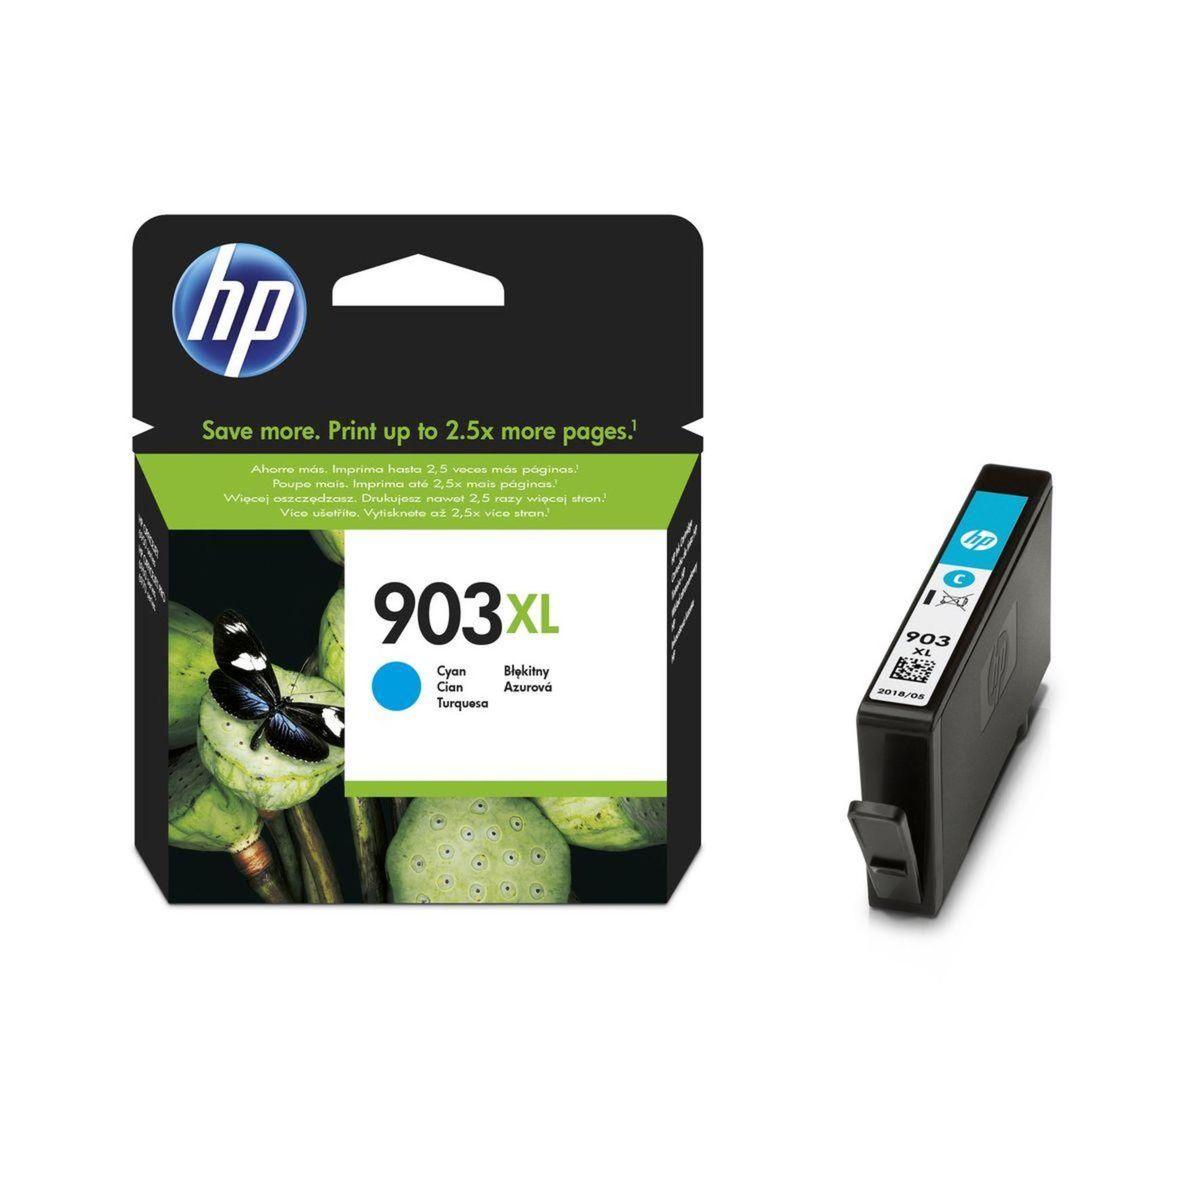 HP - Inktcartridge 903XL - Cyaan